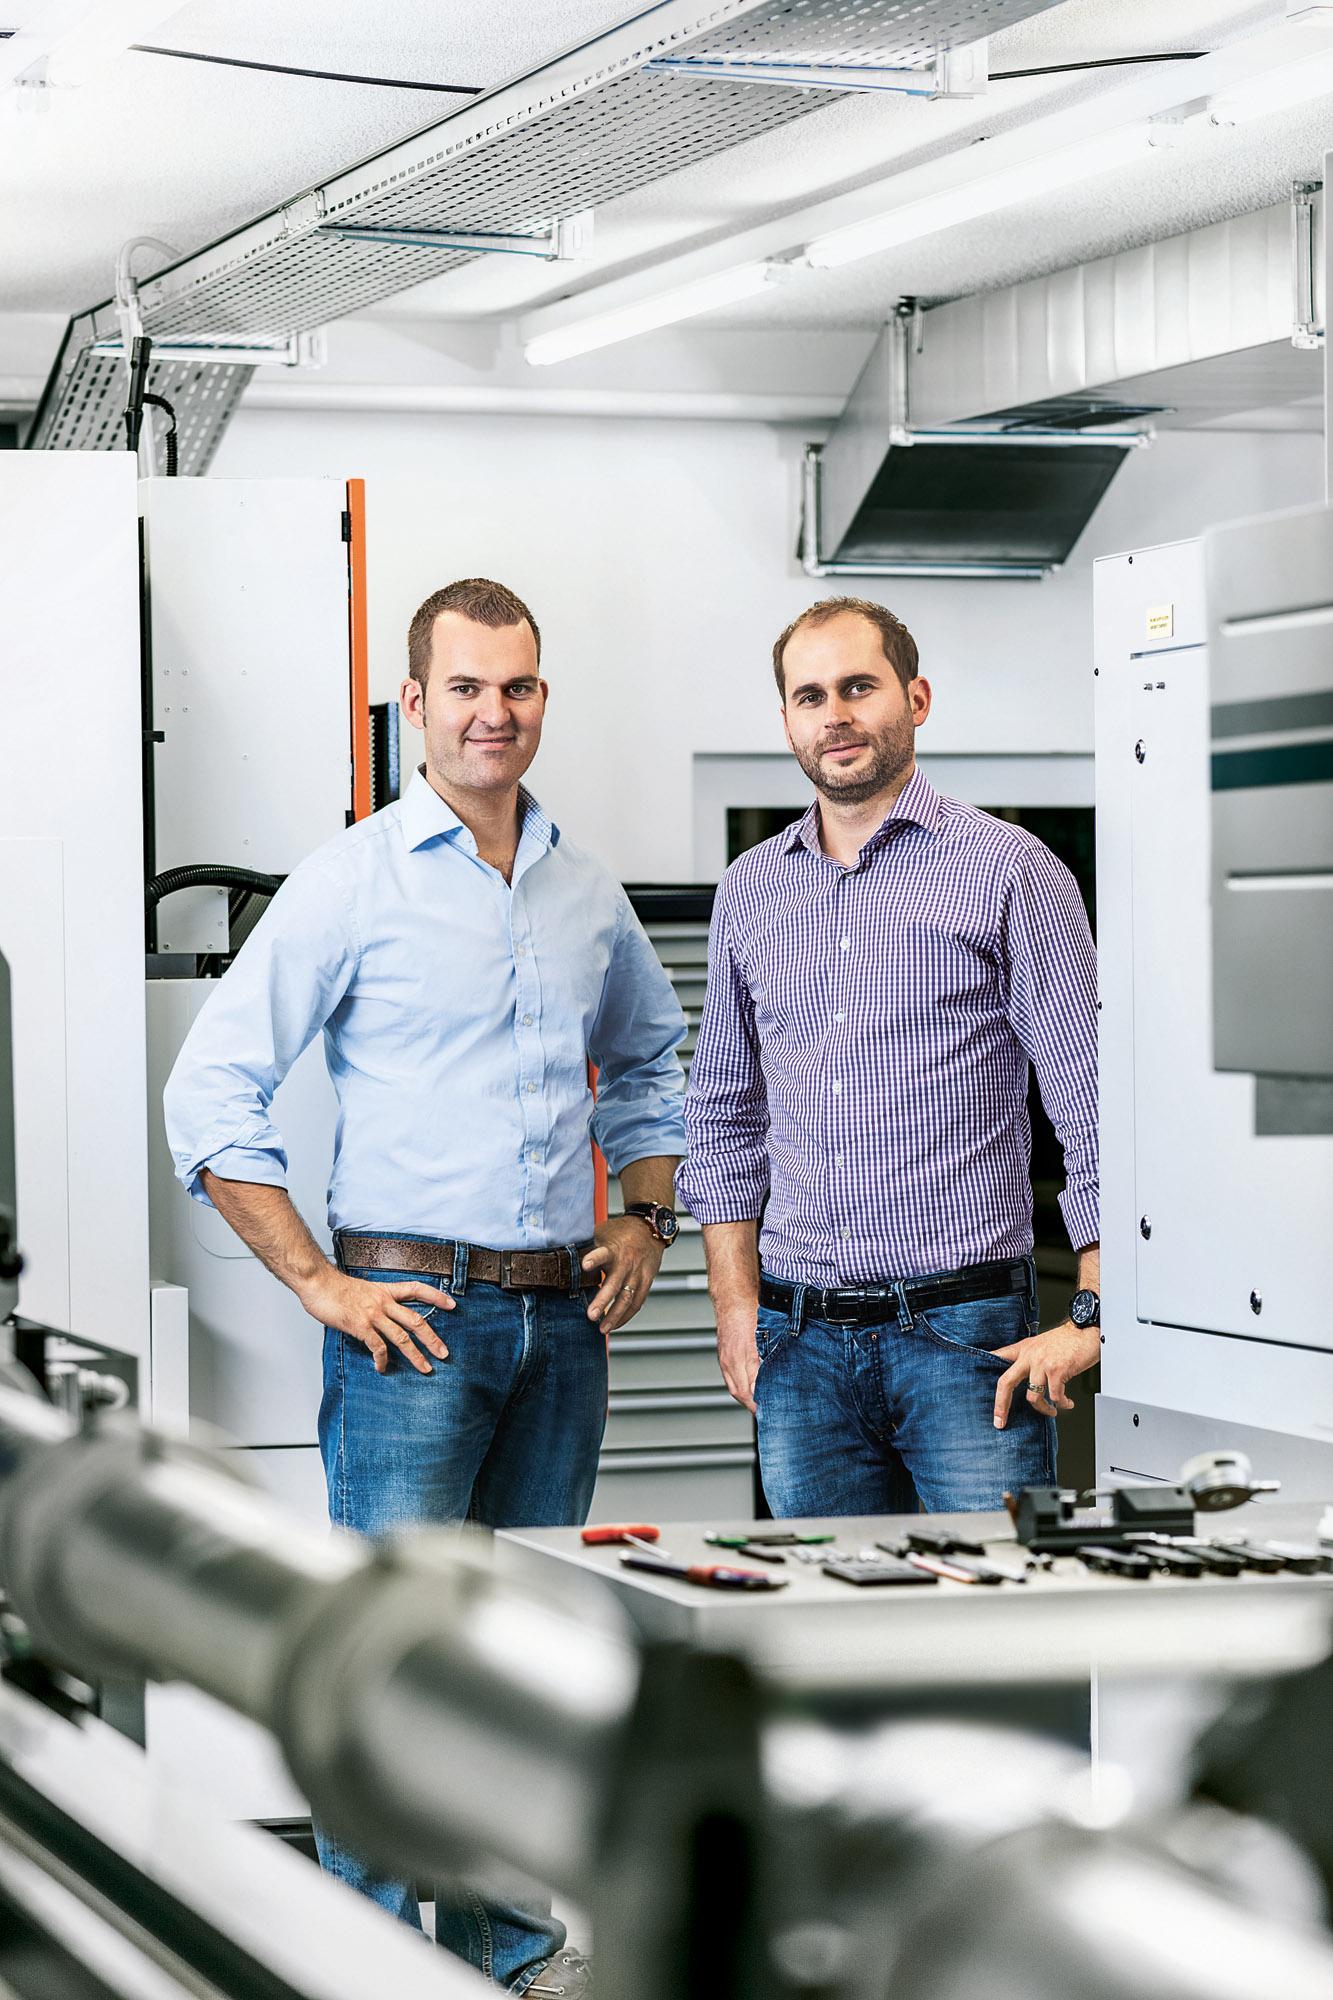 Claude Greisler (left) and Serge Michel